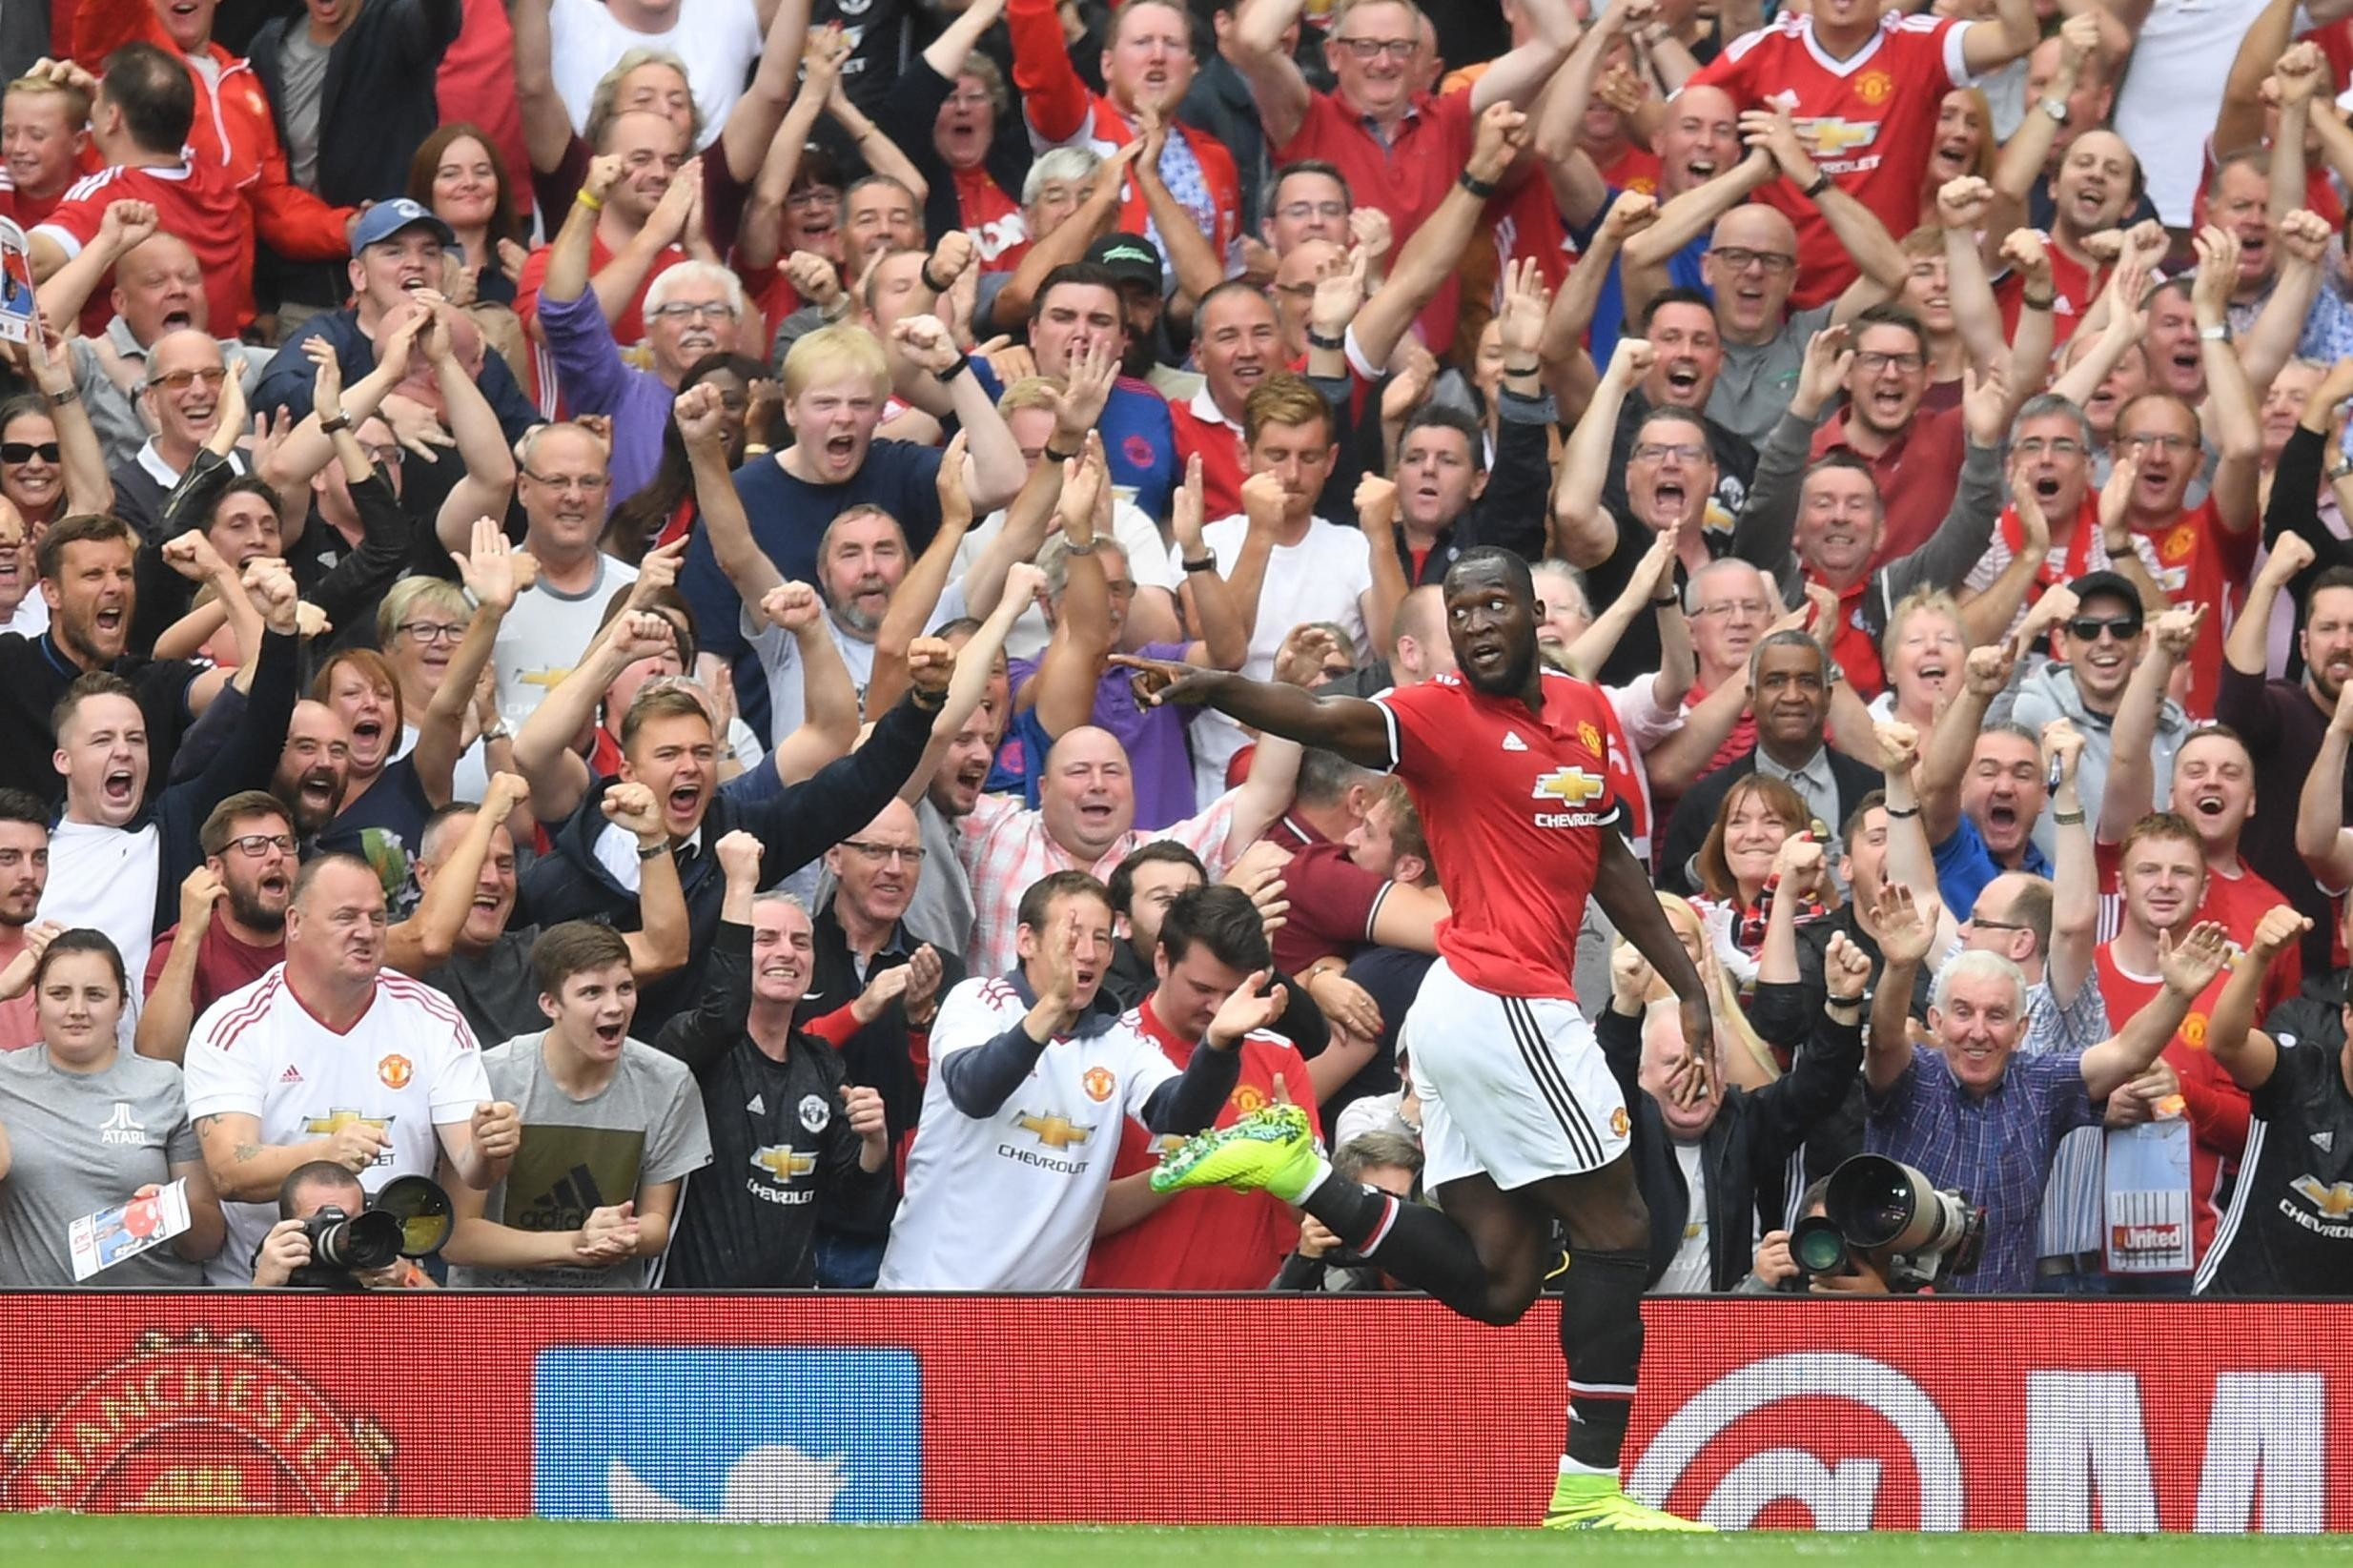 Man Utd 4-0 West Ham result: Premier League live stream as it happened |  London Evening Standard